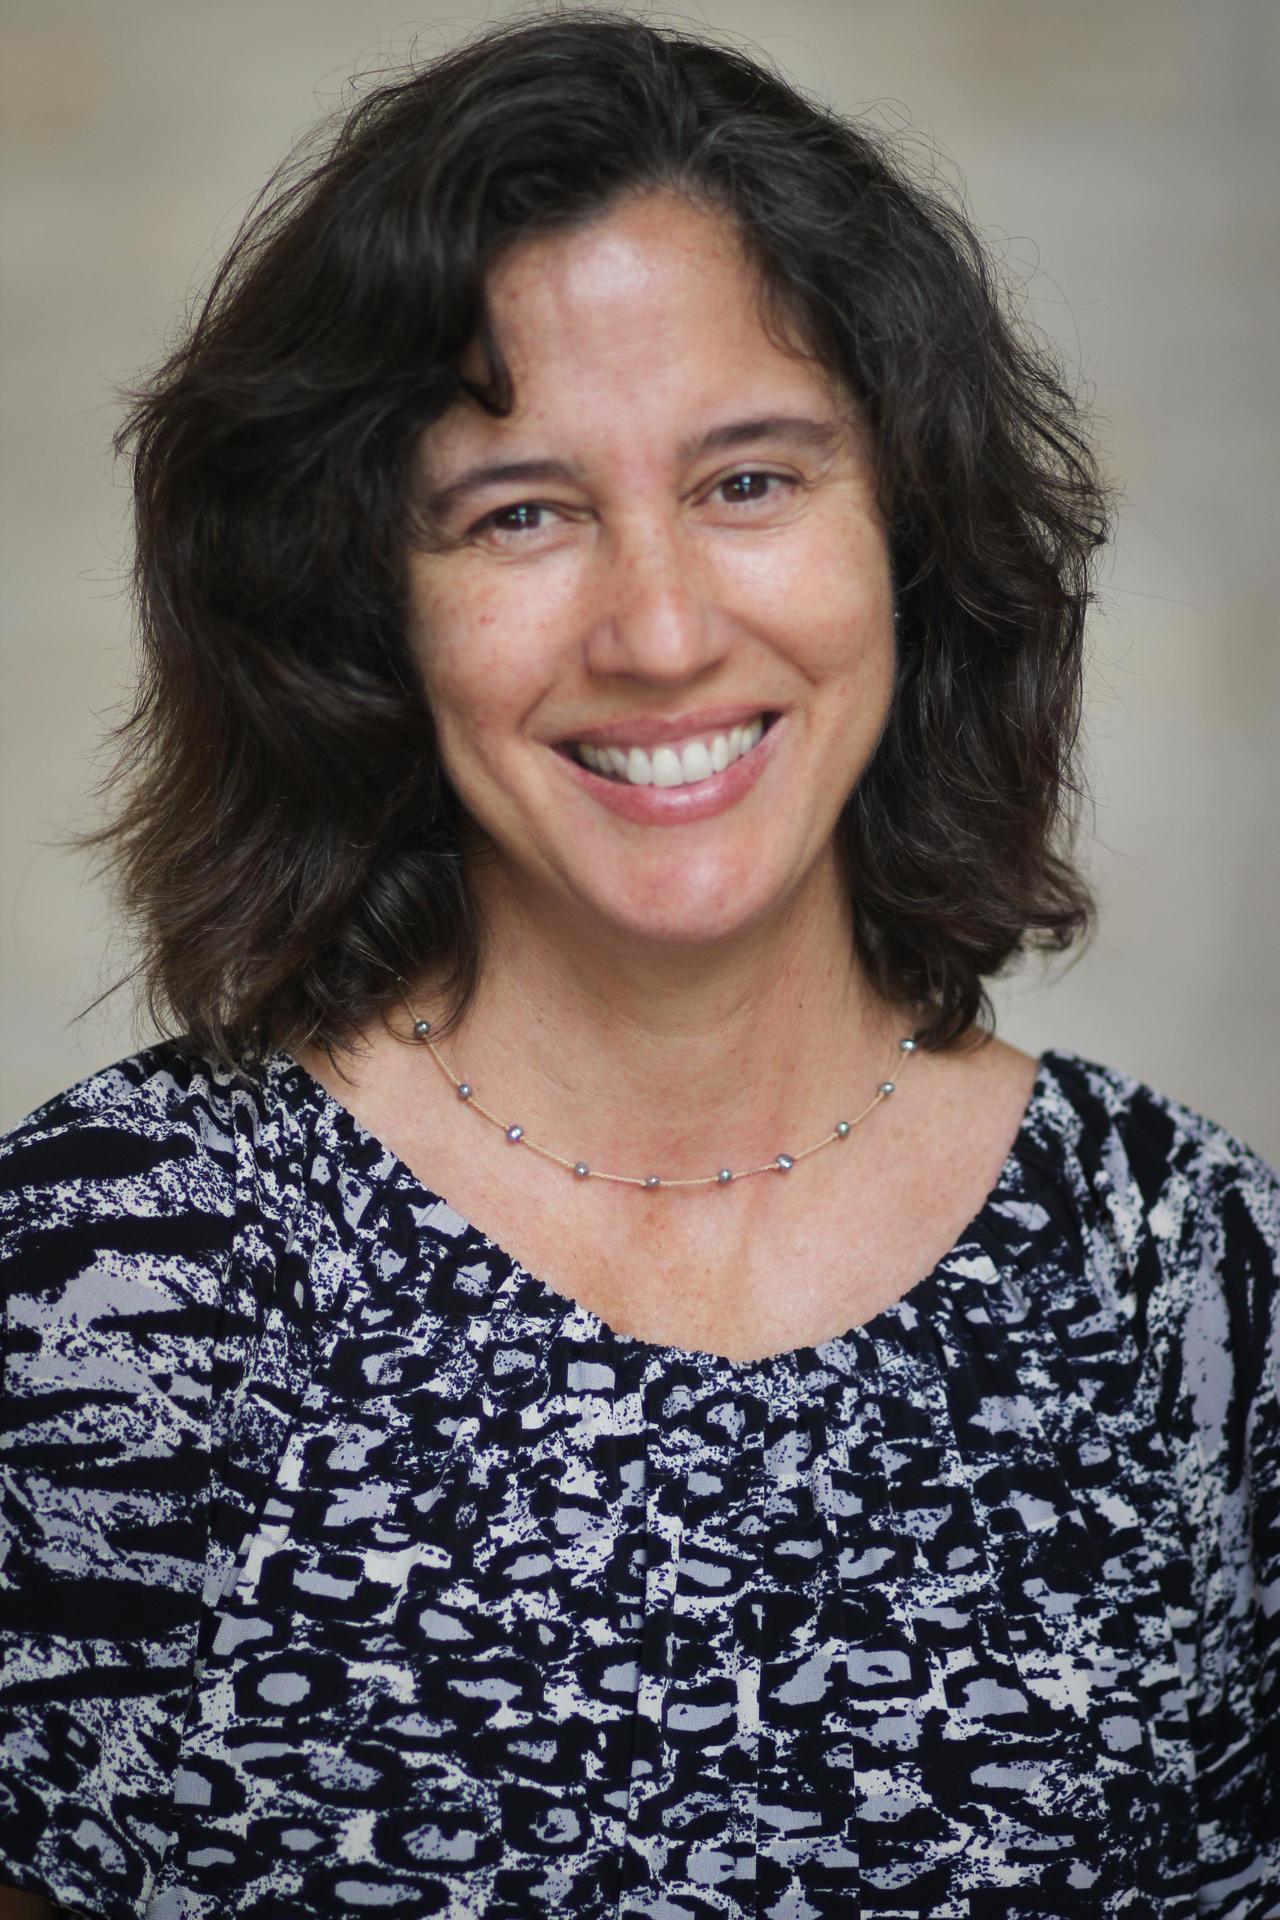 Sharon Brudner